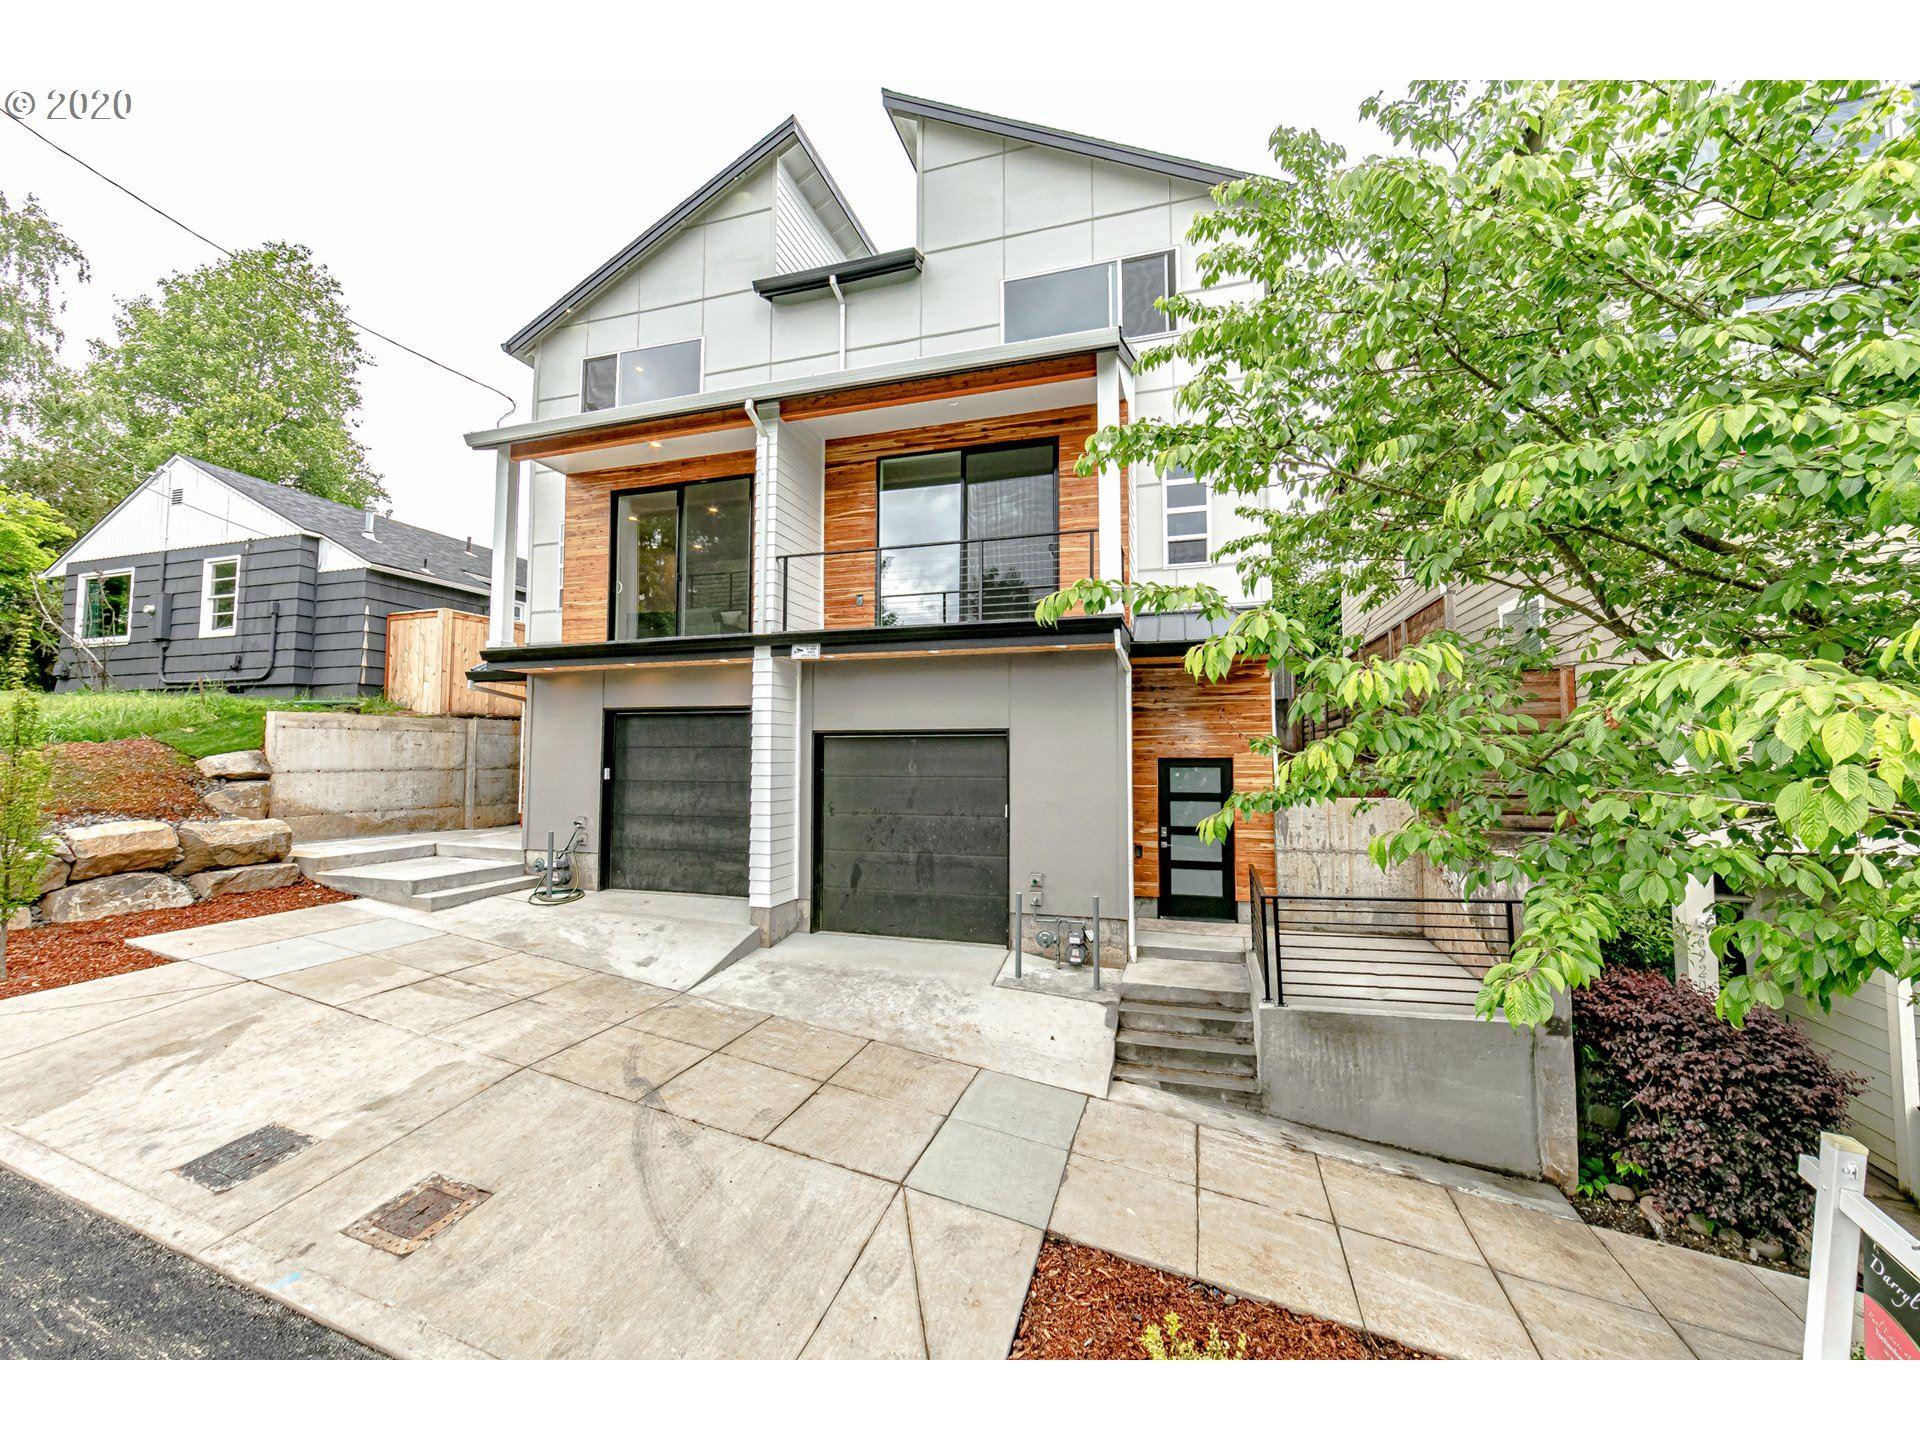 6972 N CHARLESTON AVE, Portland, OR 97203 - MLS#: 20158653